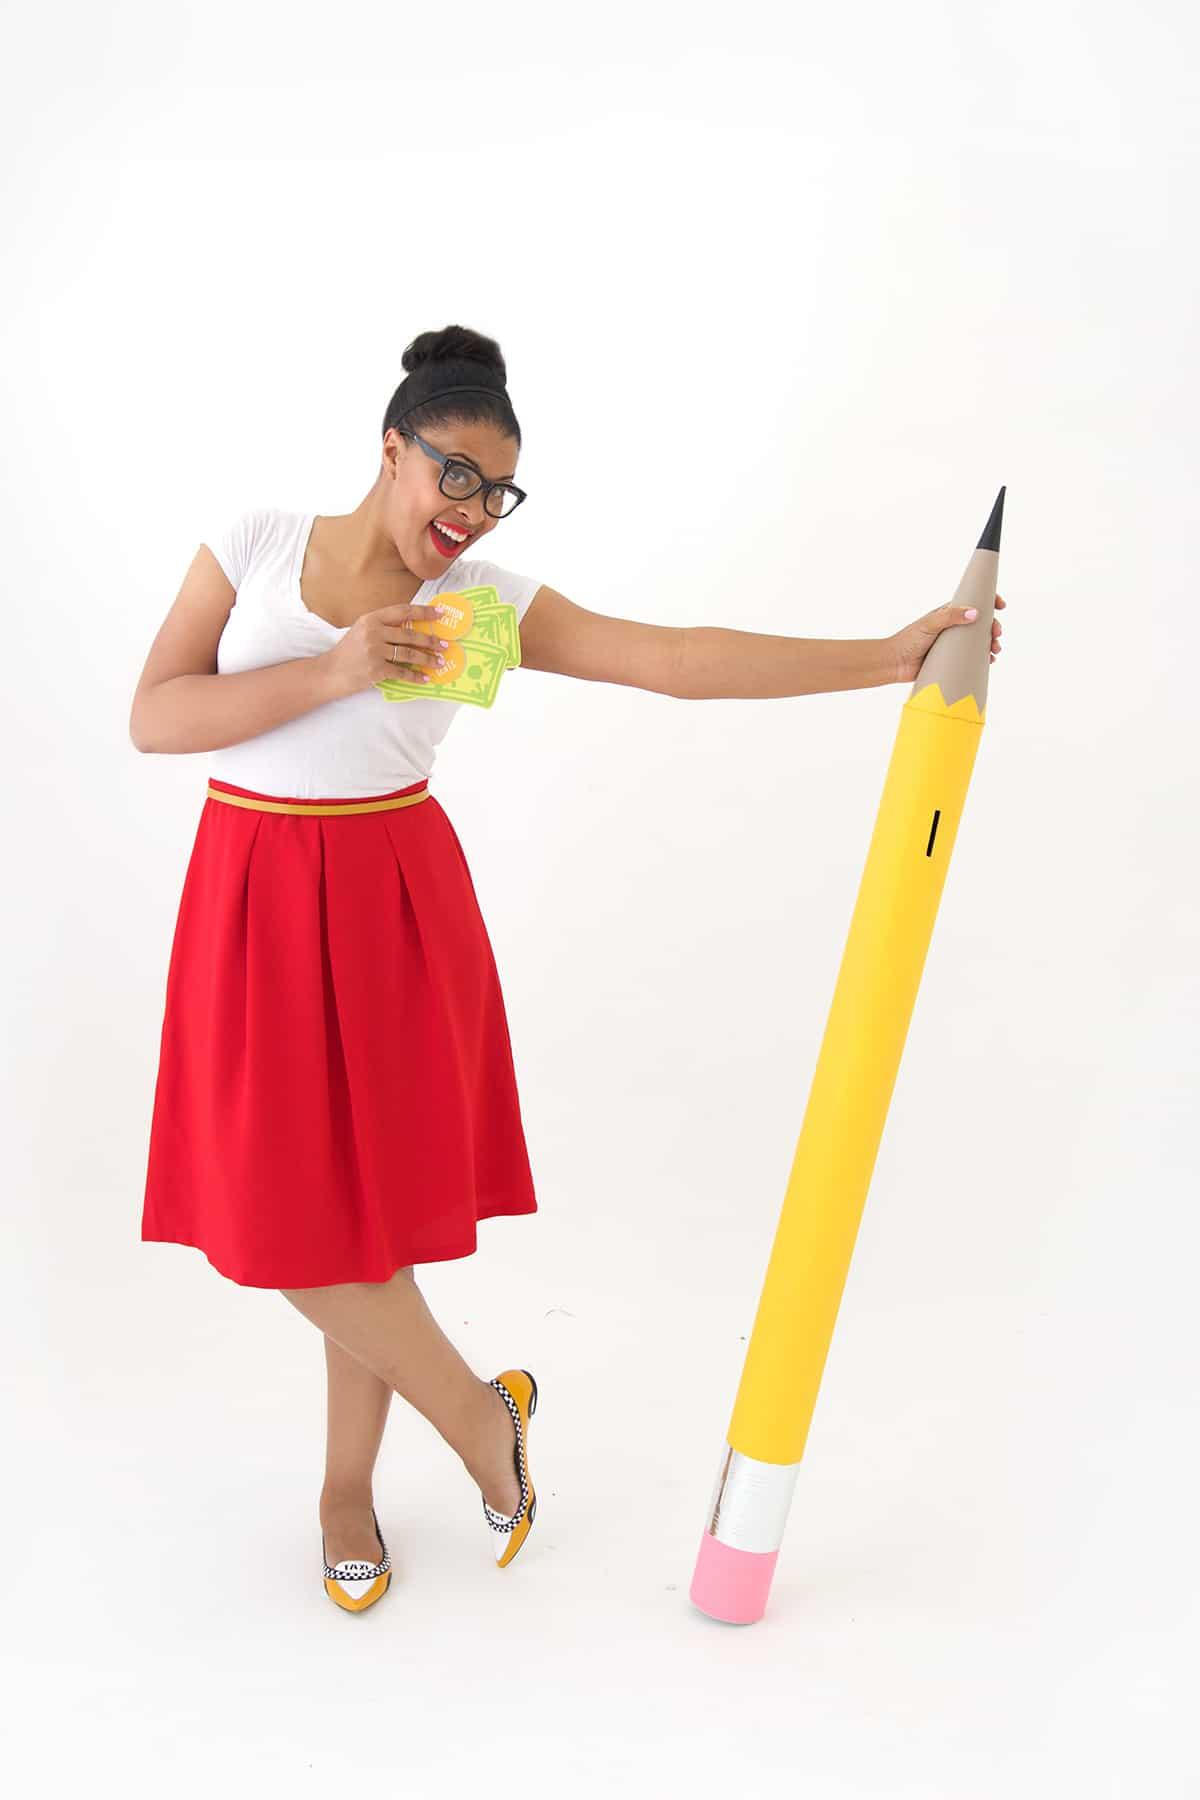 Pencil piggy bank